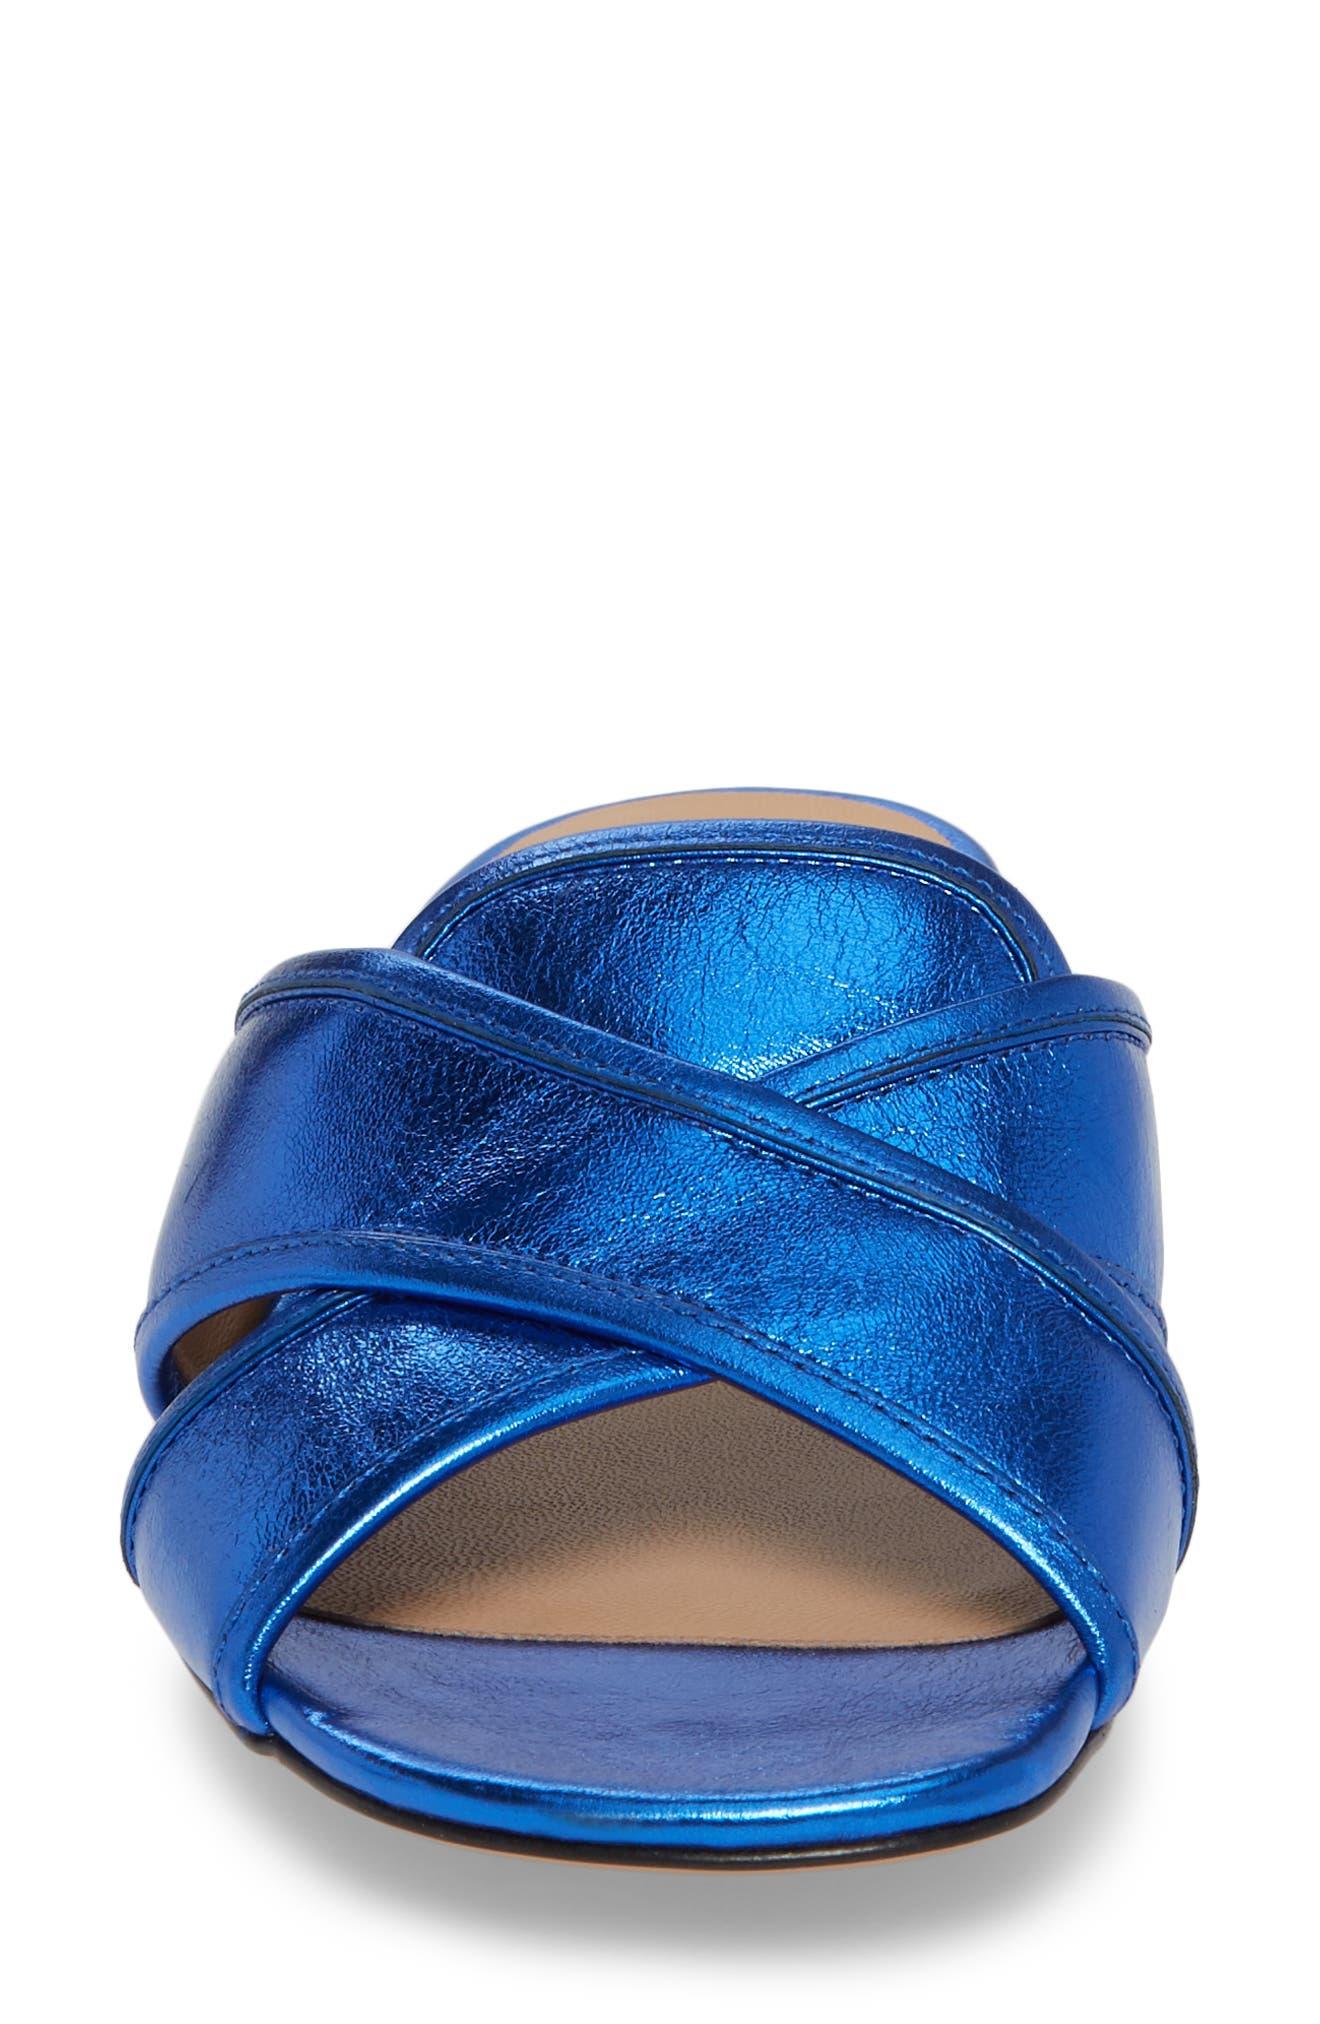 Aurora Metallic Slide Sandal,                             Alternate thumbnail 4, color,                             BLUE